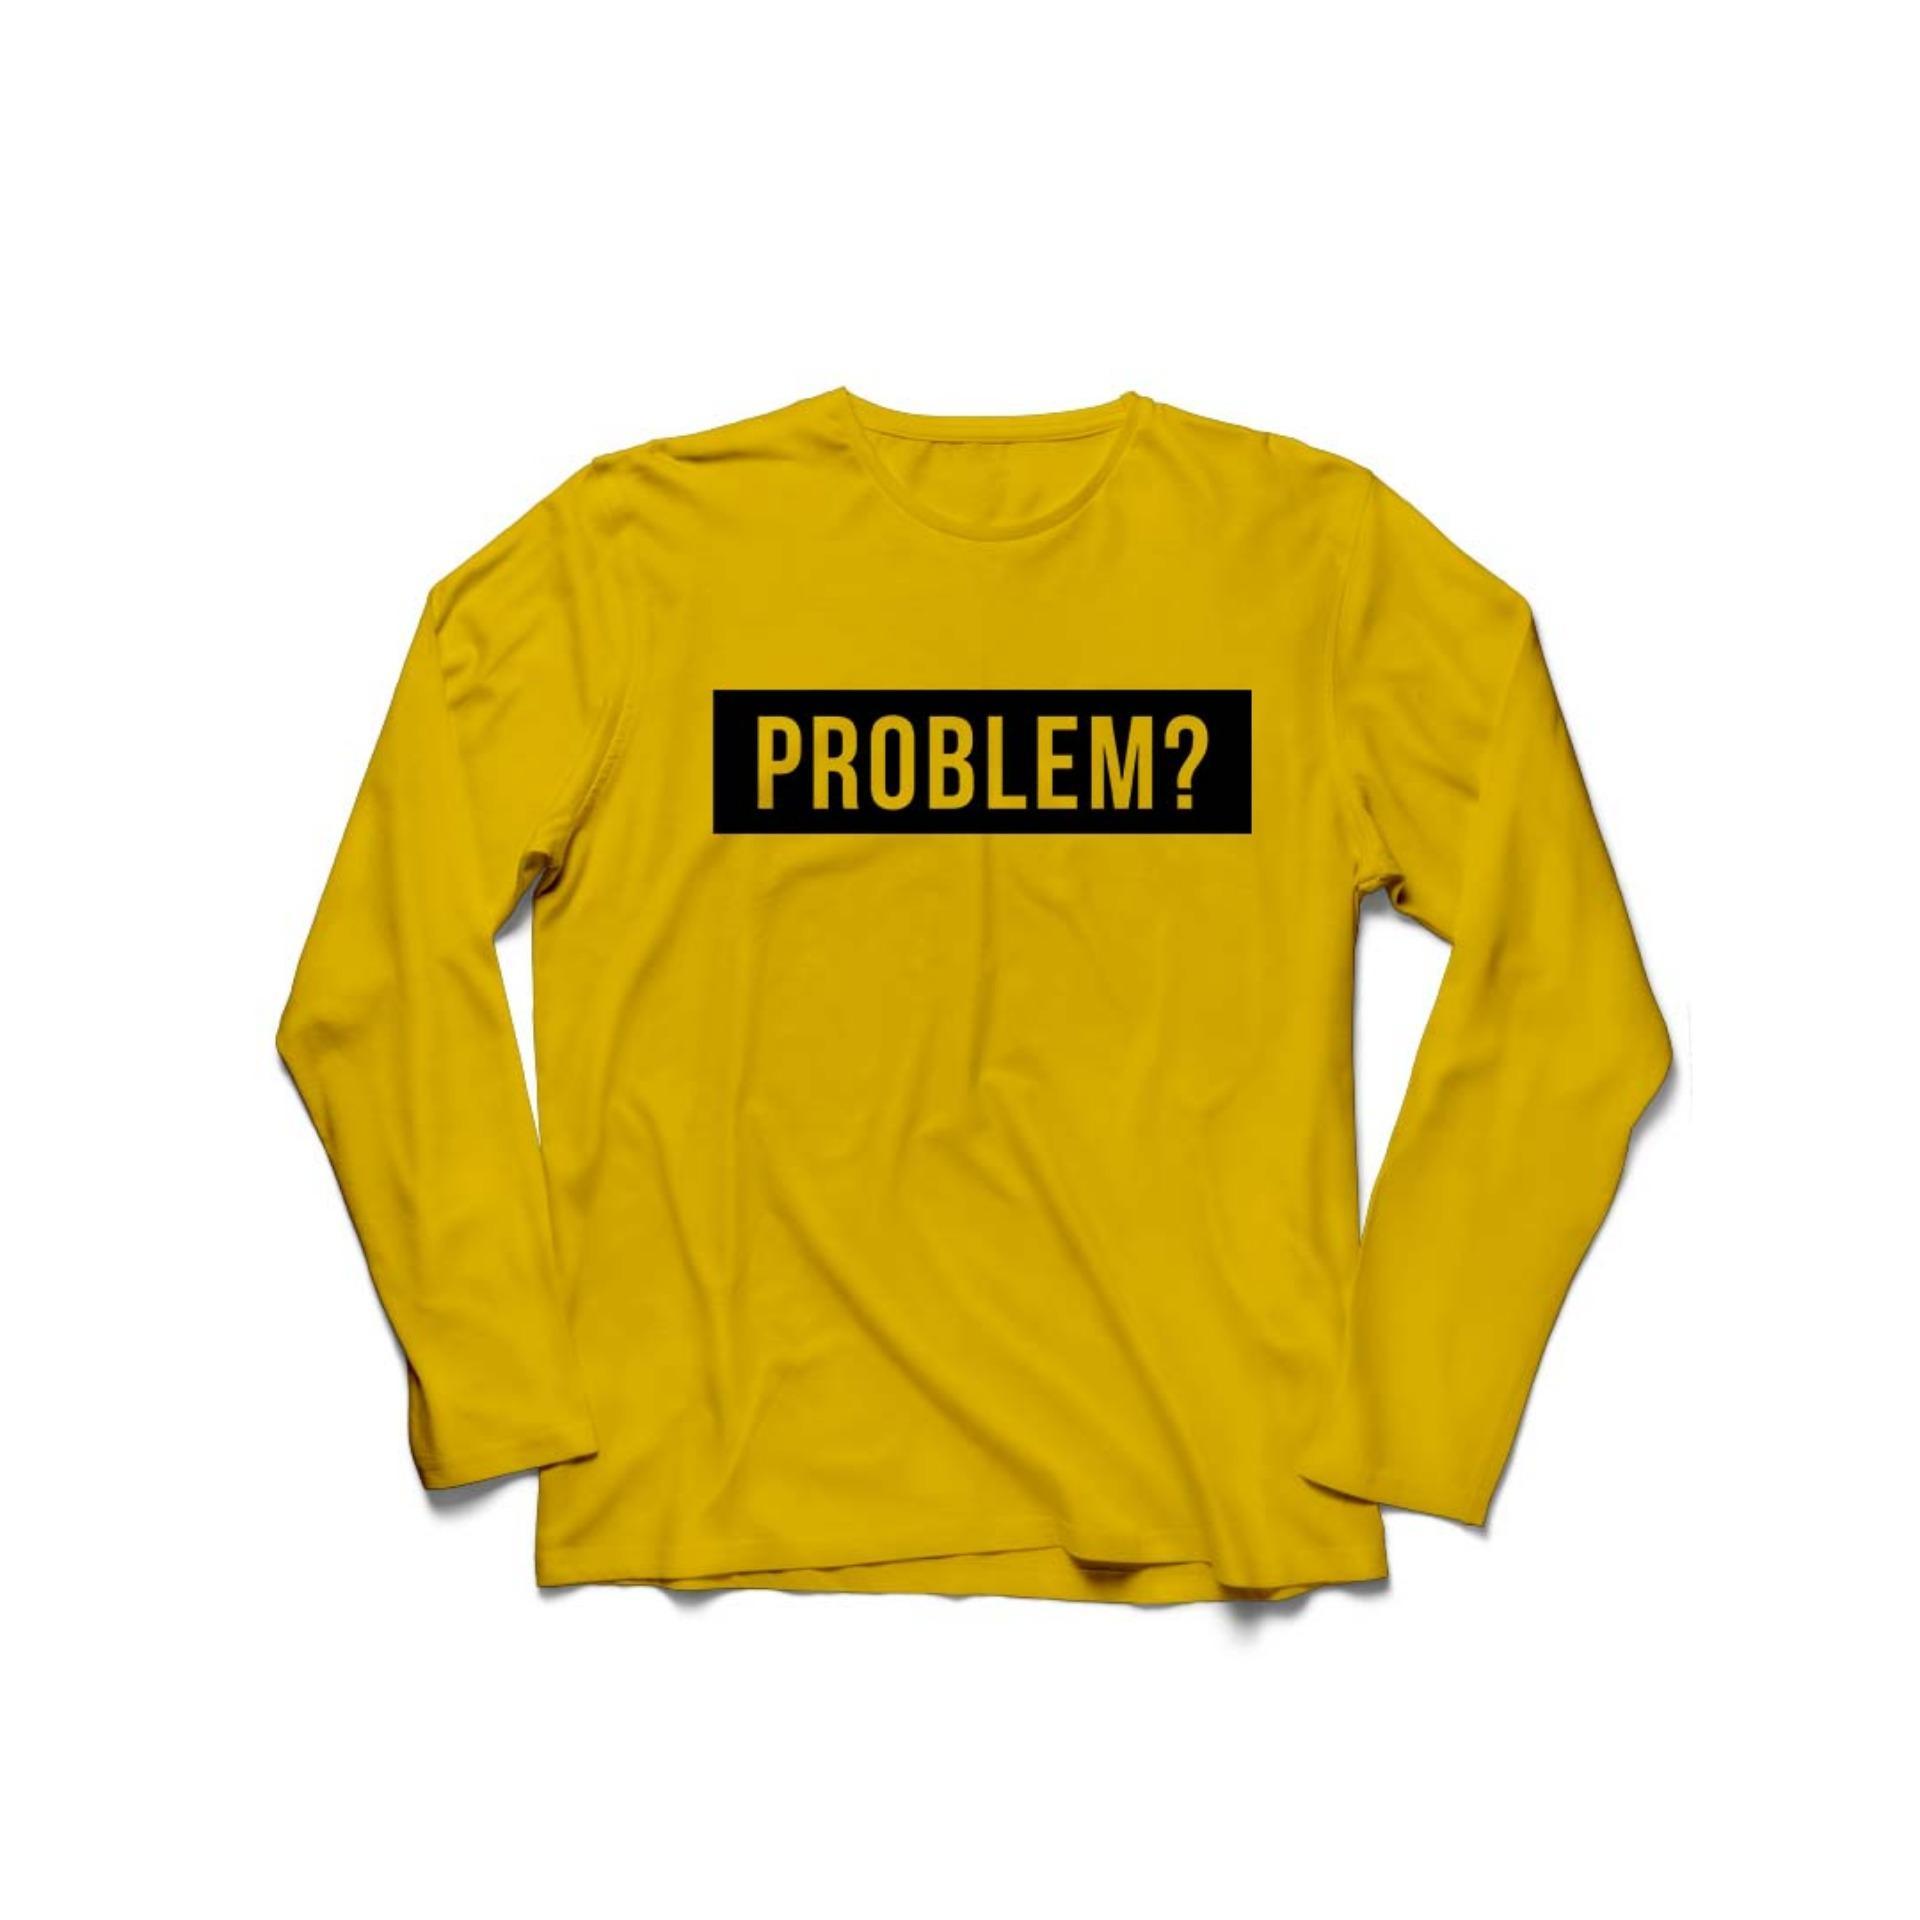 ... Tumblr Tee Cewek / Kaos Wanita / Tshirt Cewe Cotton. Source · -62%. POLARISSHIRT - Baju Kaos T- shirt PROBLEM? Lengan Panjang Longsleeve